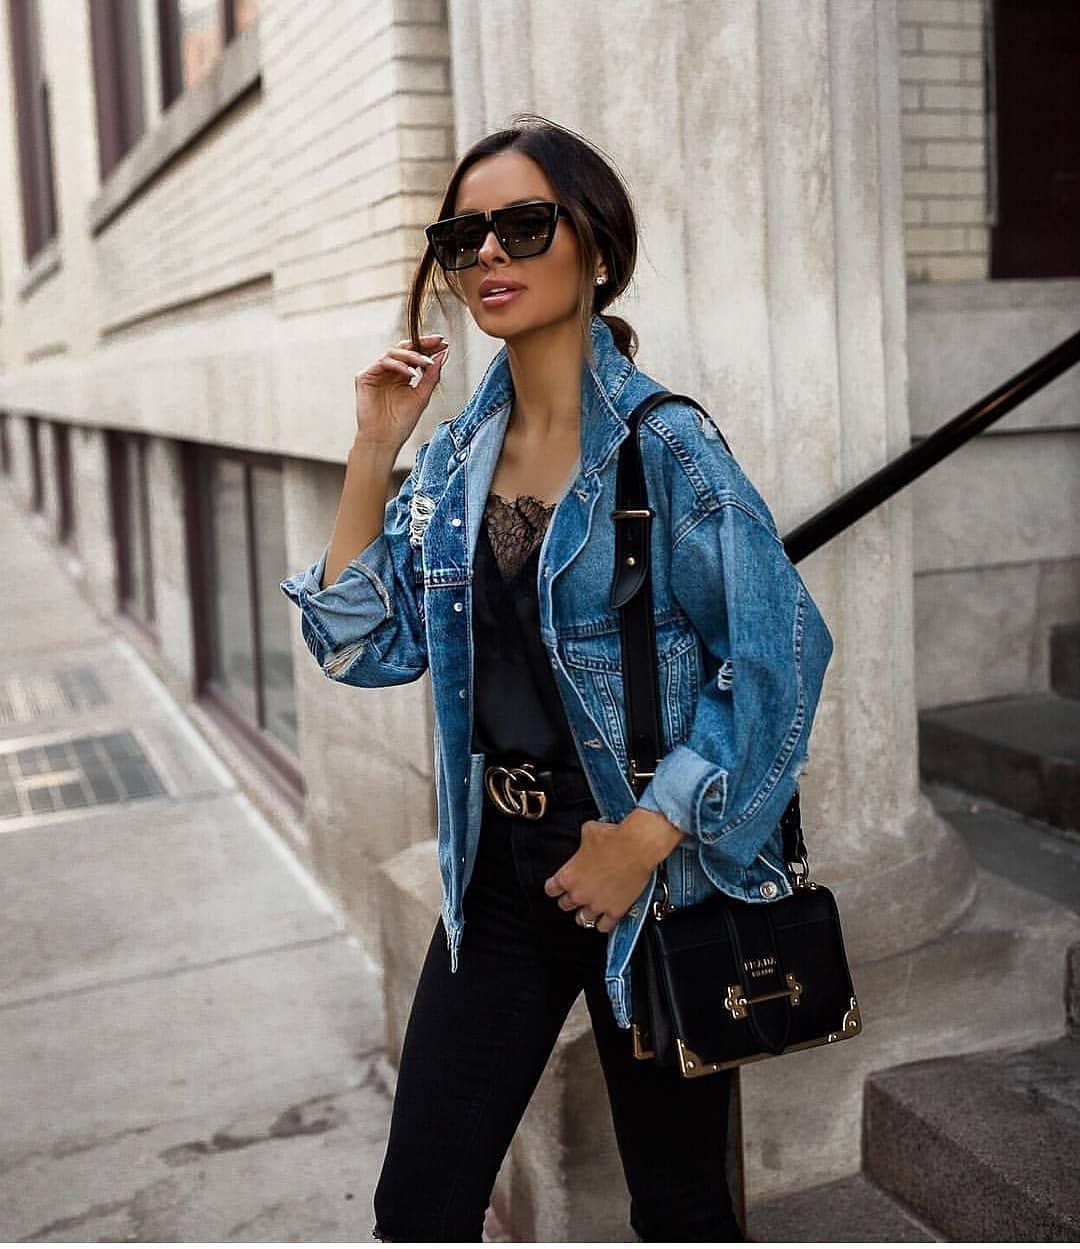 fashion____daily____2_4_2019_1_15_4_383.jpg